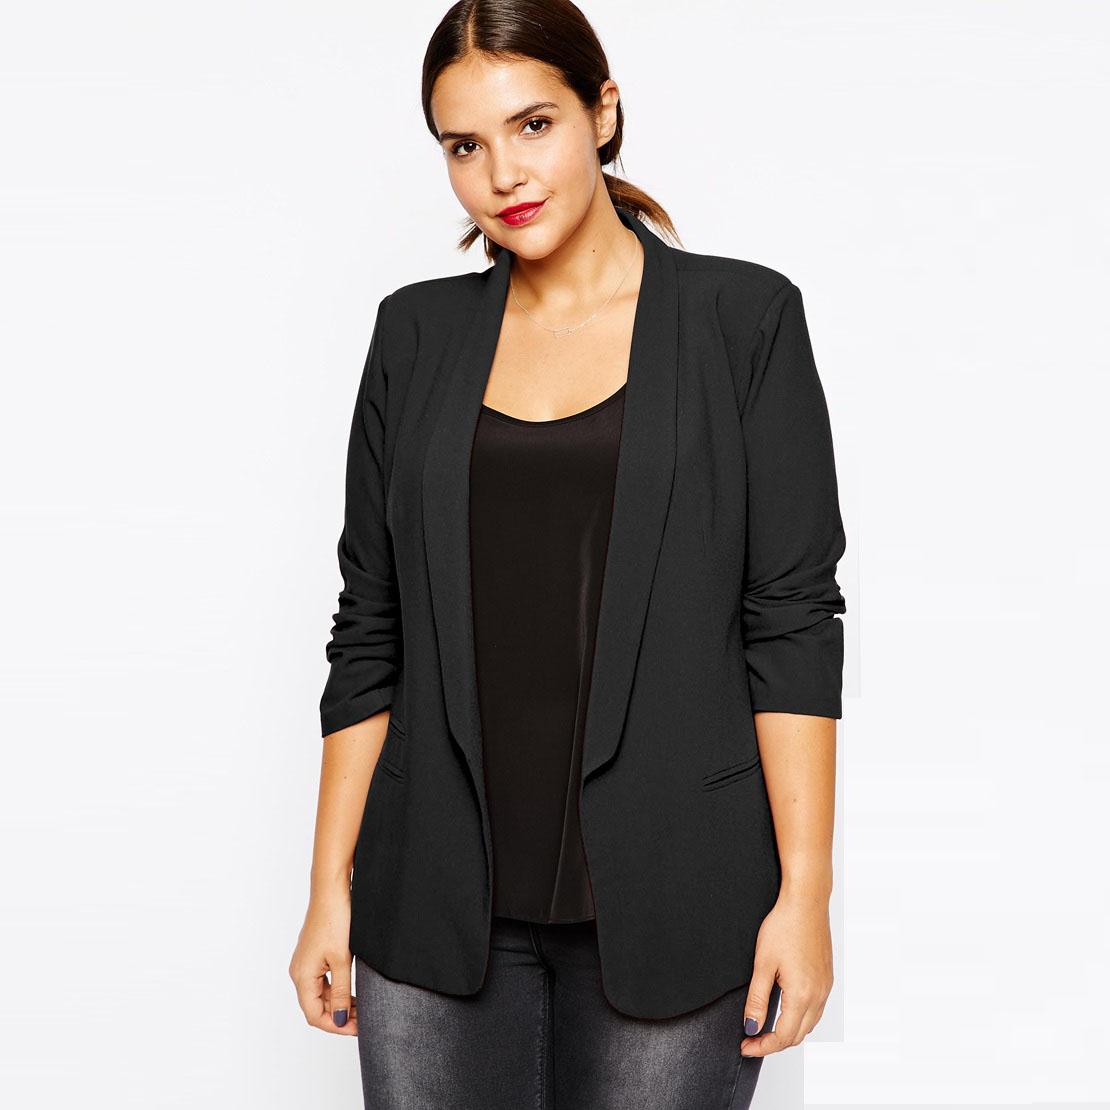 Plus Size Women Clothing Black Blazer in Crepe with Slim Lapel Office Women Blazers And Jackets Basic Workwear 4XL 5XL 6XL 7XL